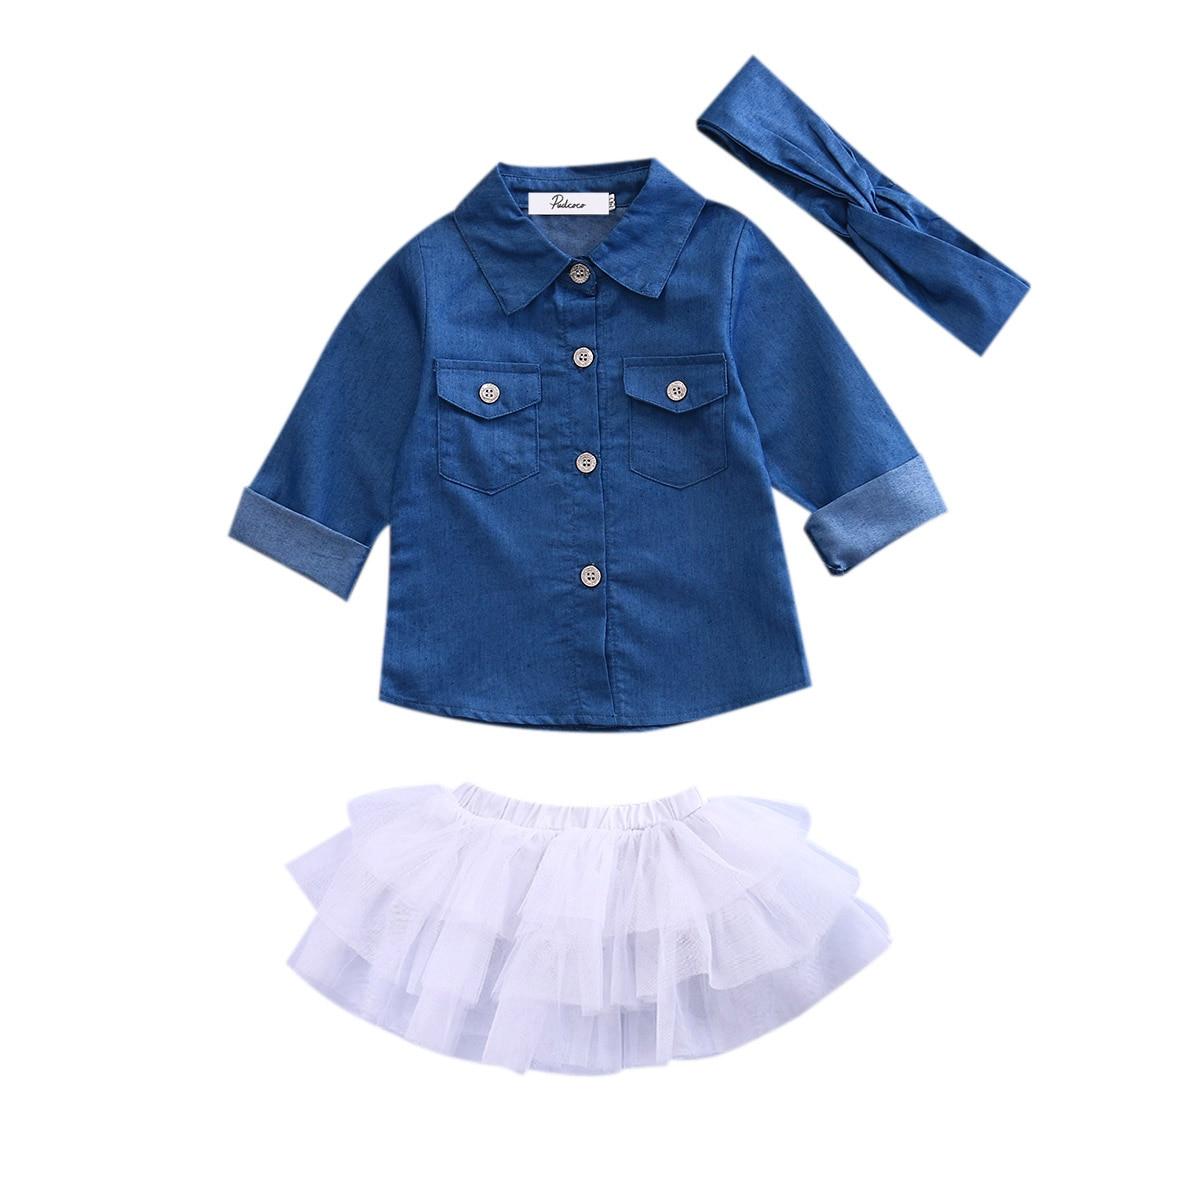 Babies Girl Summer Clothing Set Baby Girls Denim Shirt Top +Tutu Skirts+Headband 3pcs Outfits Sets New